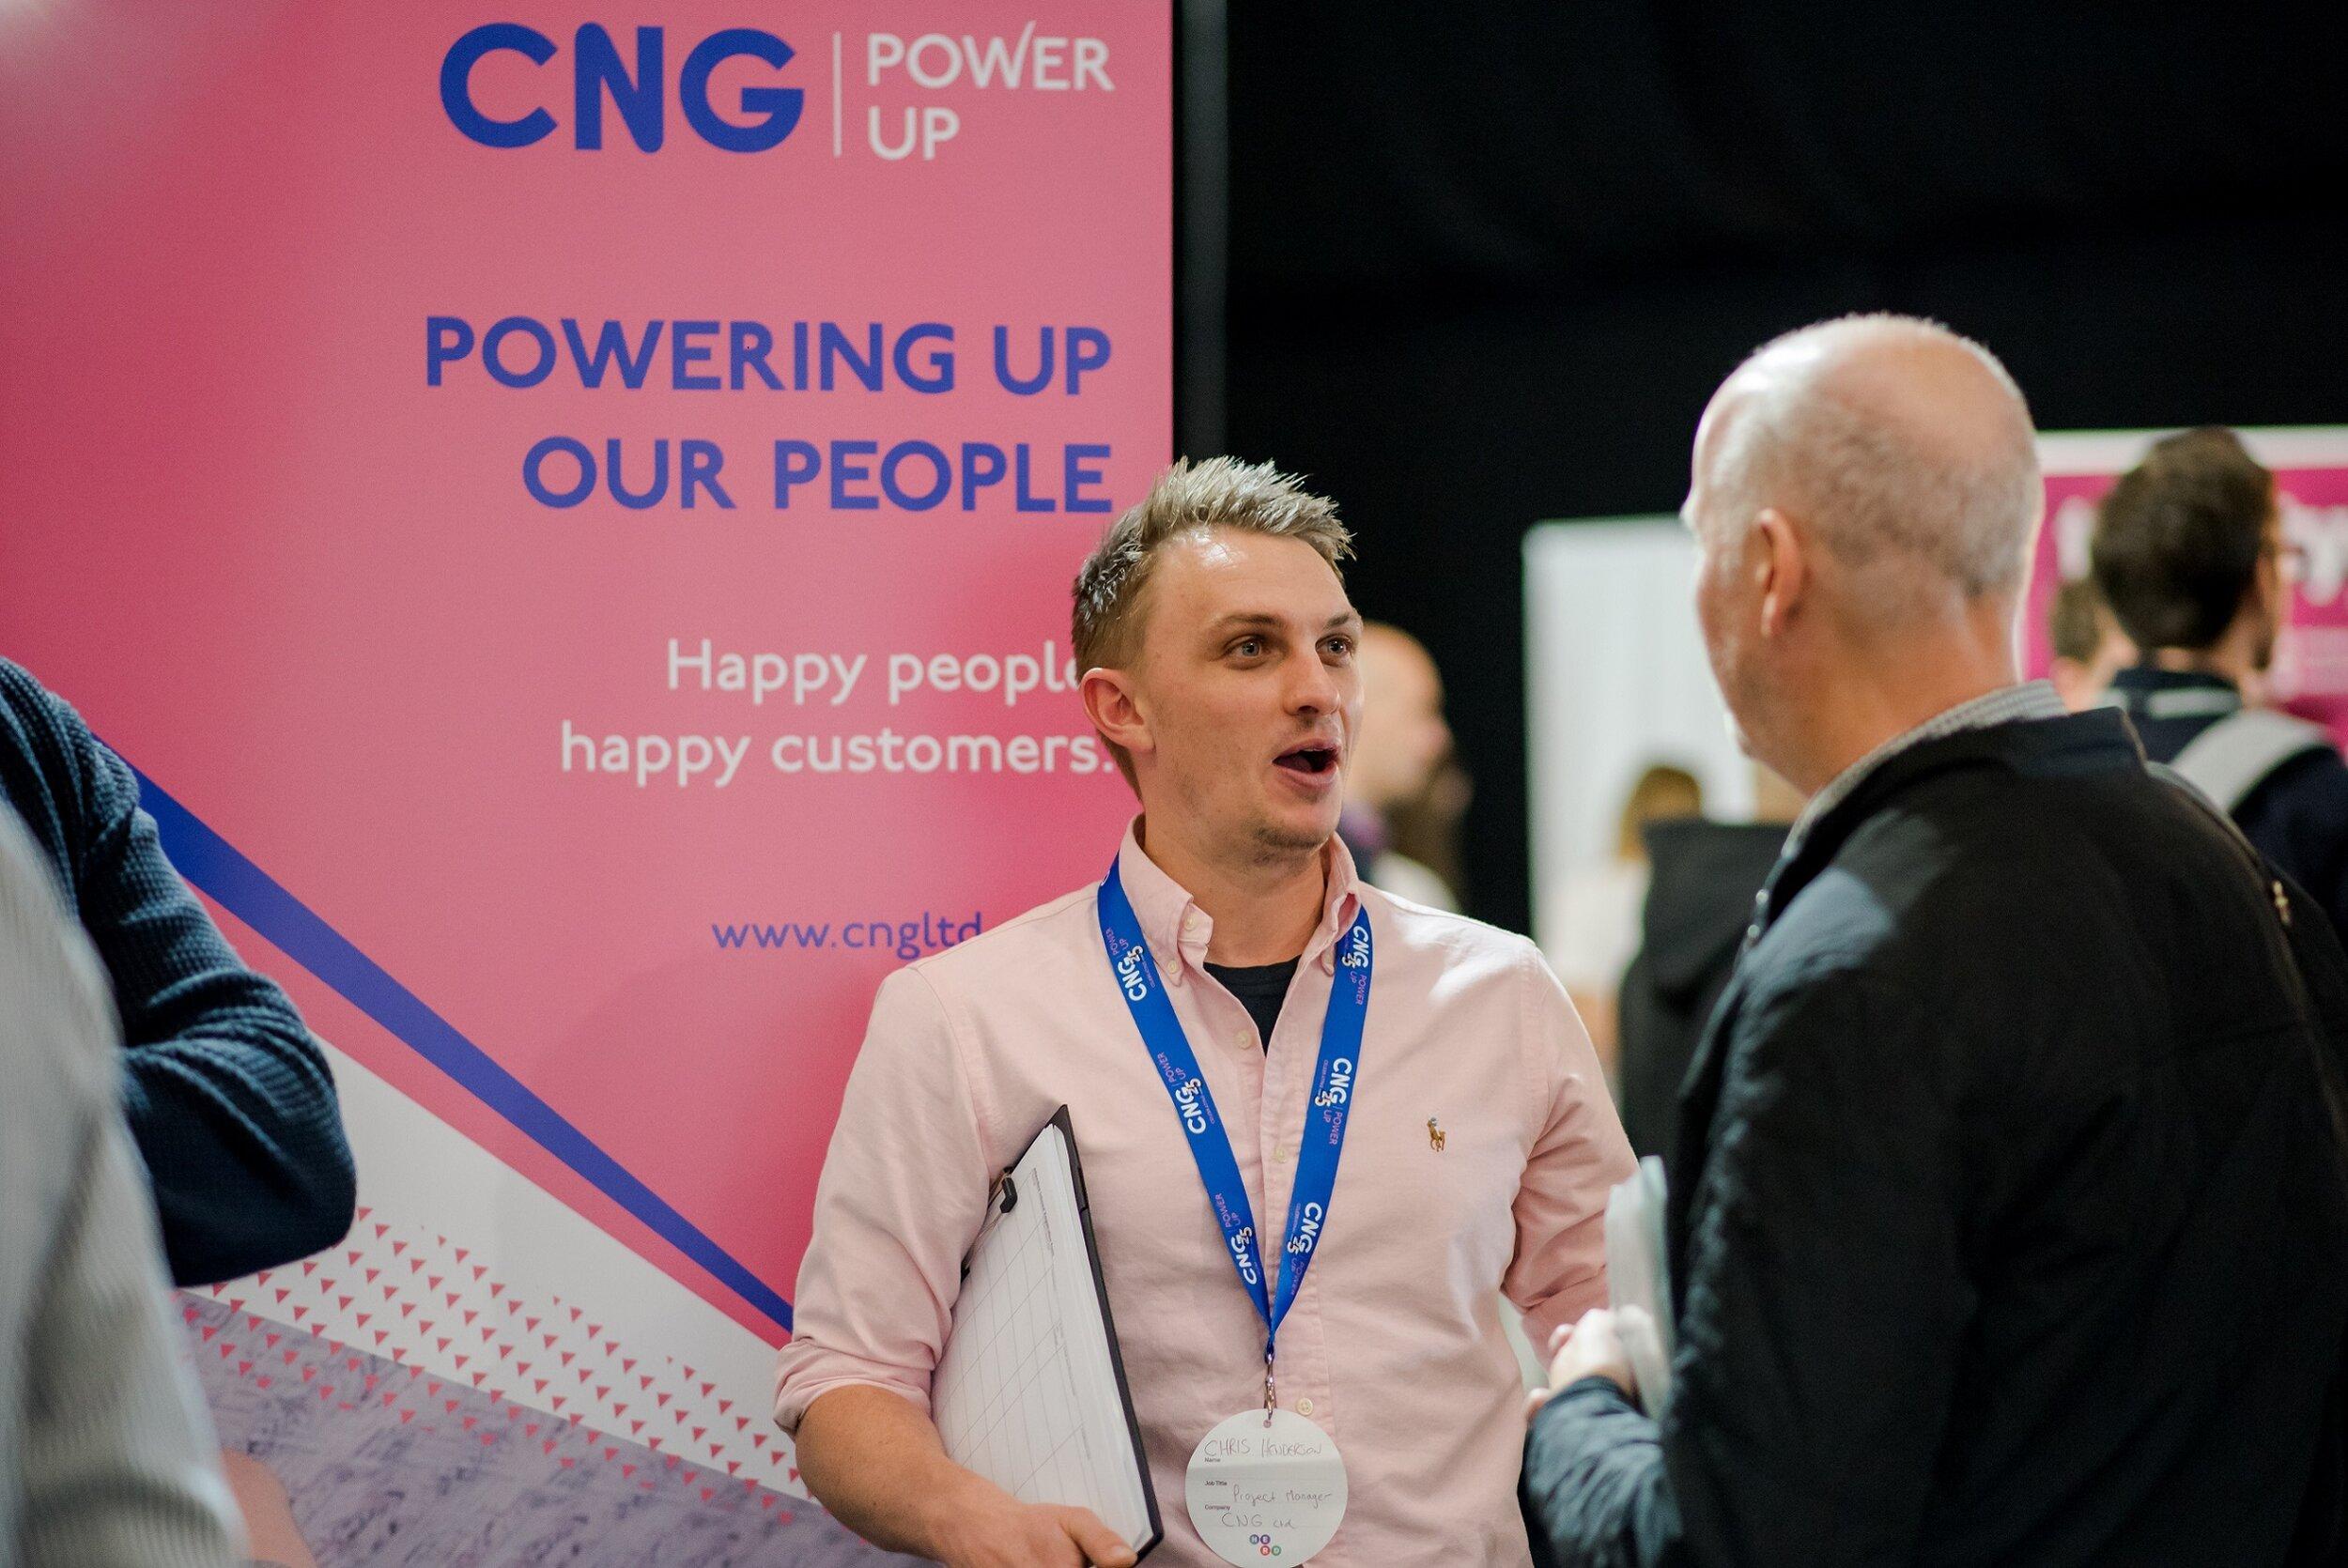 The CNG stand at Leeds Digital Job Fair 5.0